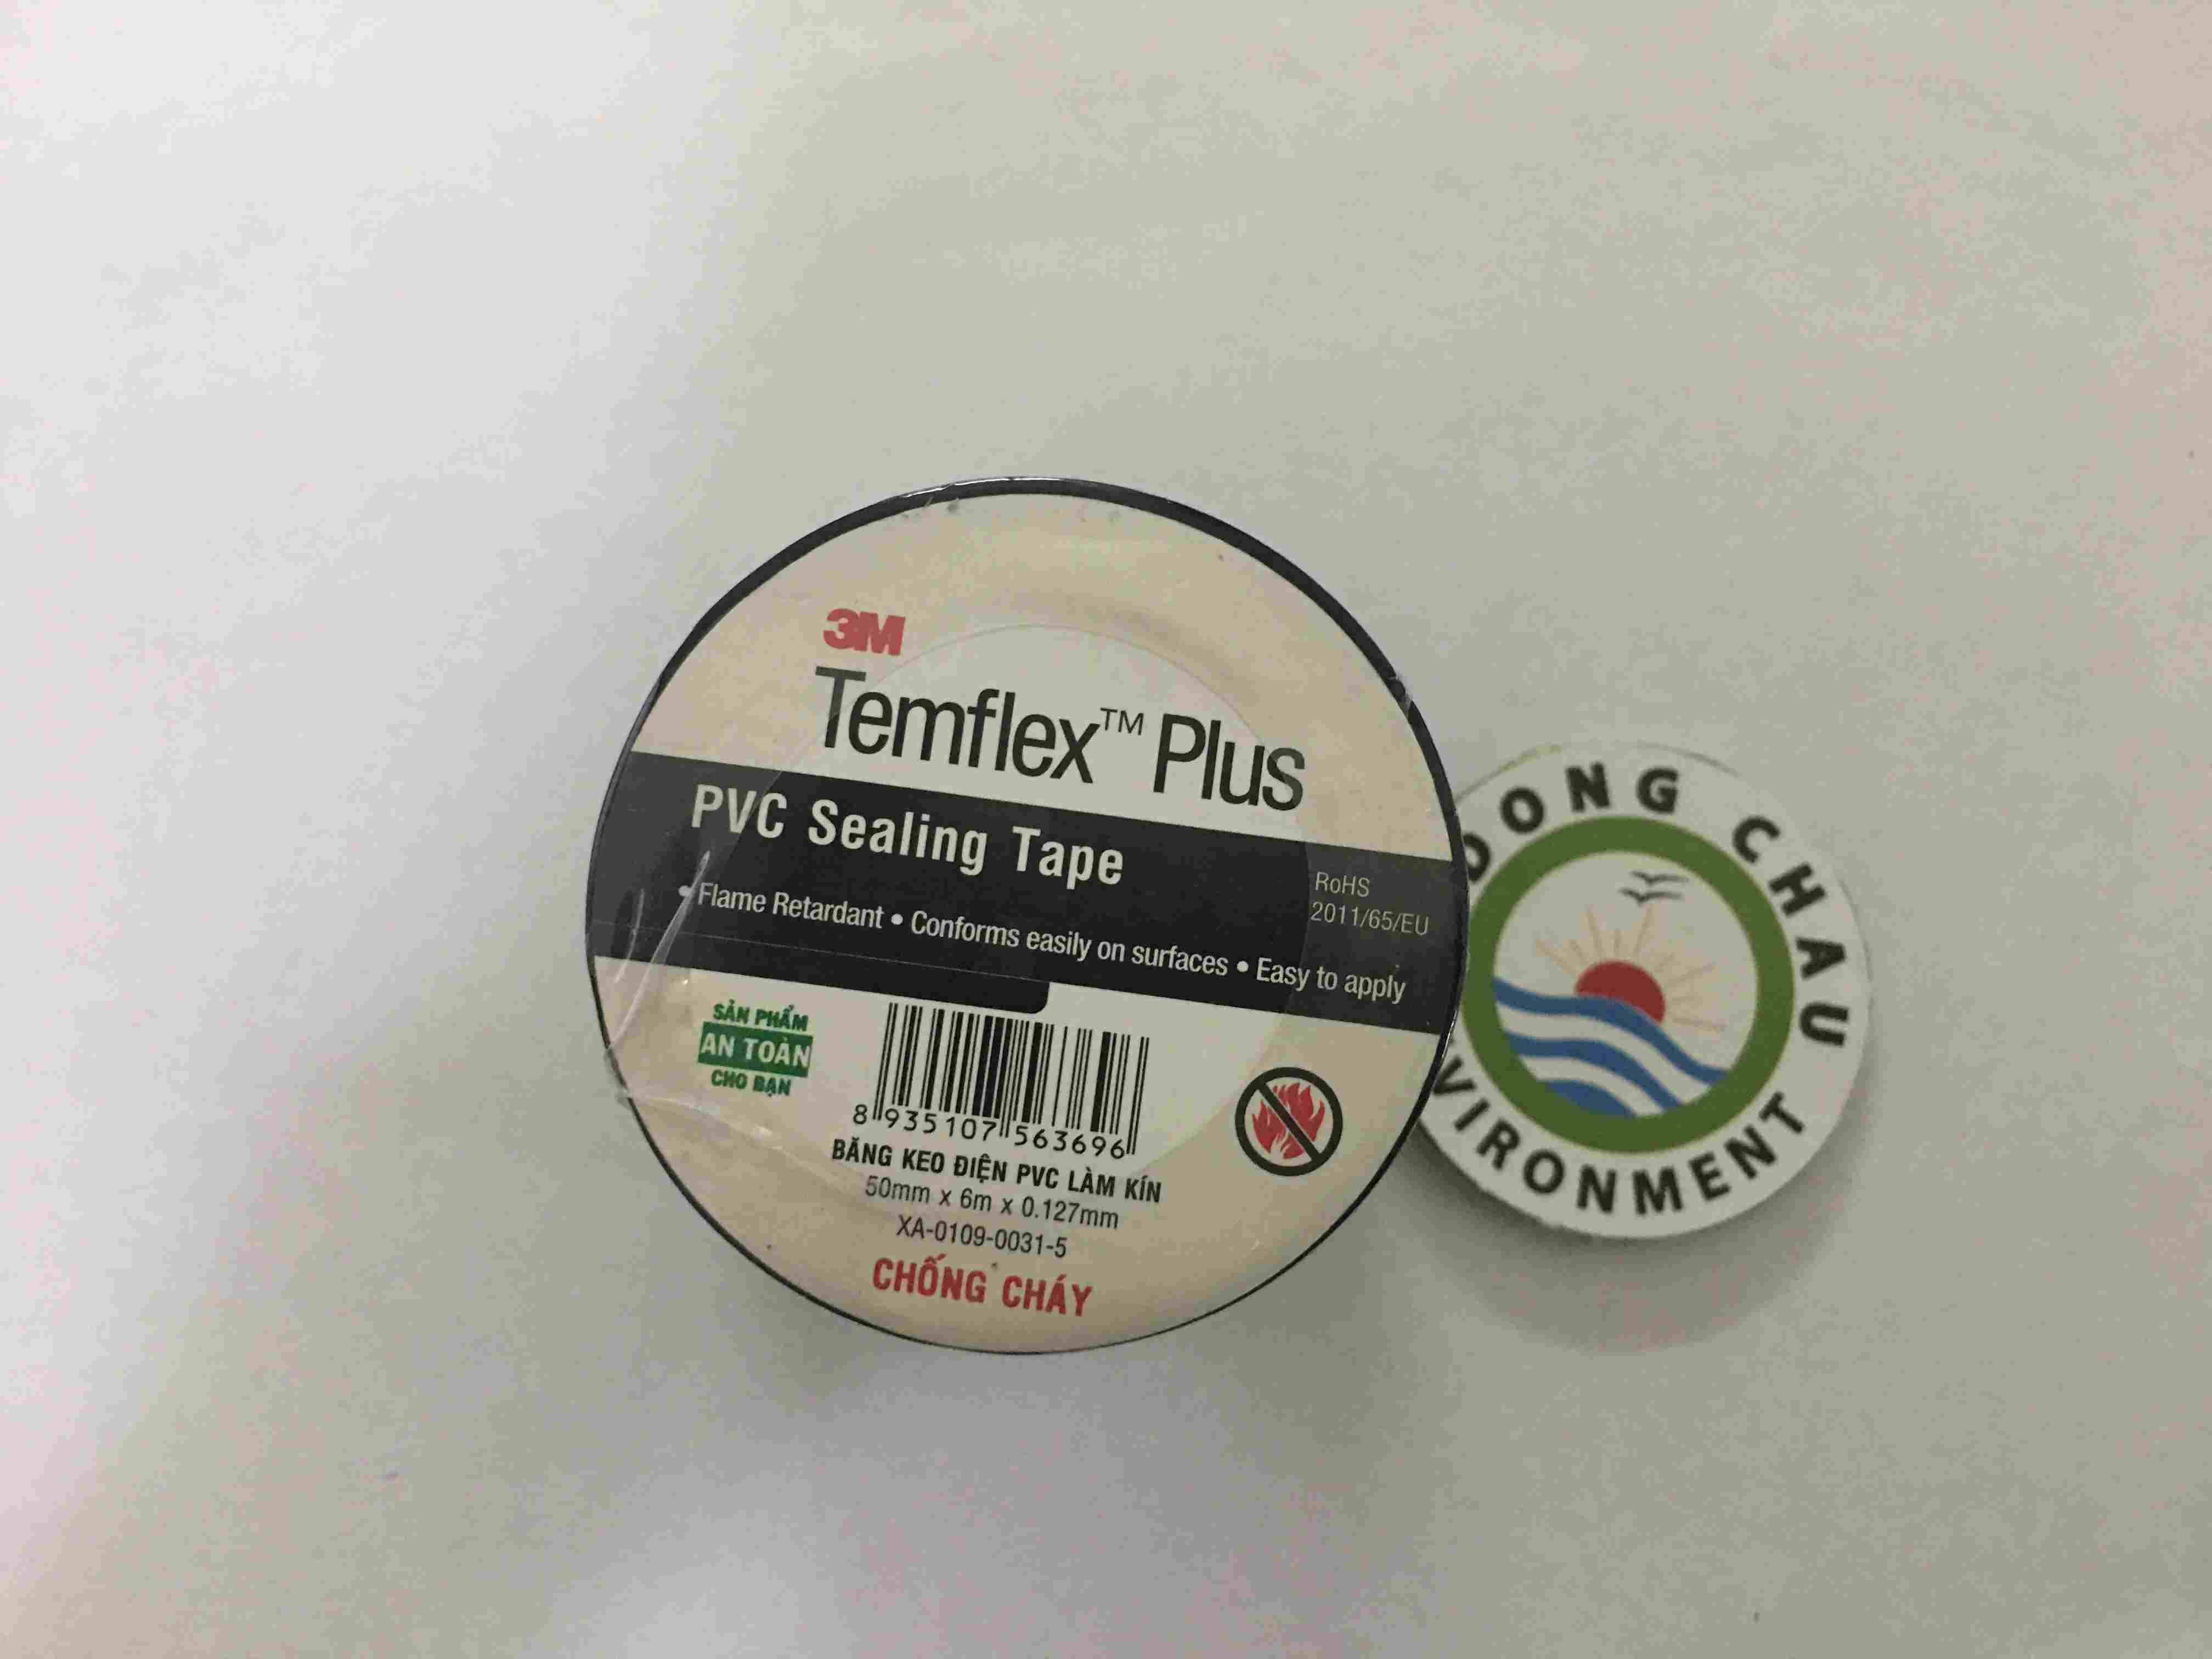 Băng Keo Điện 3M Templex Plus 50mm, băng keo điện chịu nhiệt 3M, băng keo điện 3M mỹ, băng keo templex plus